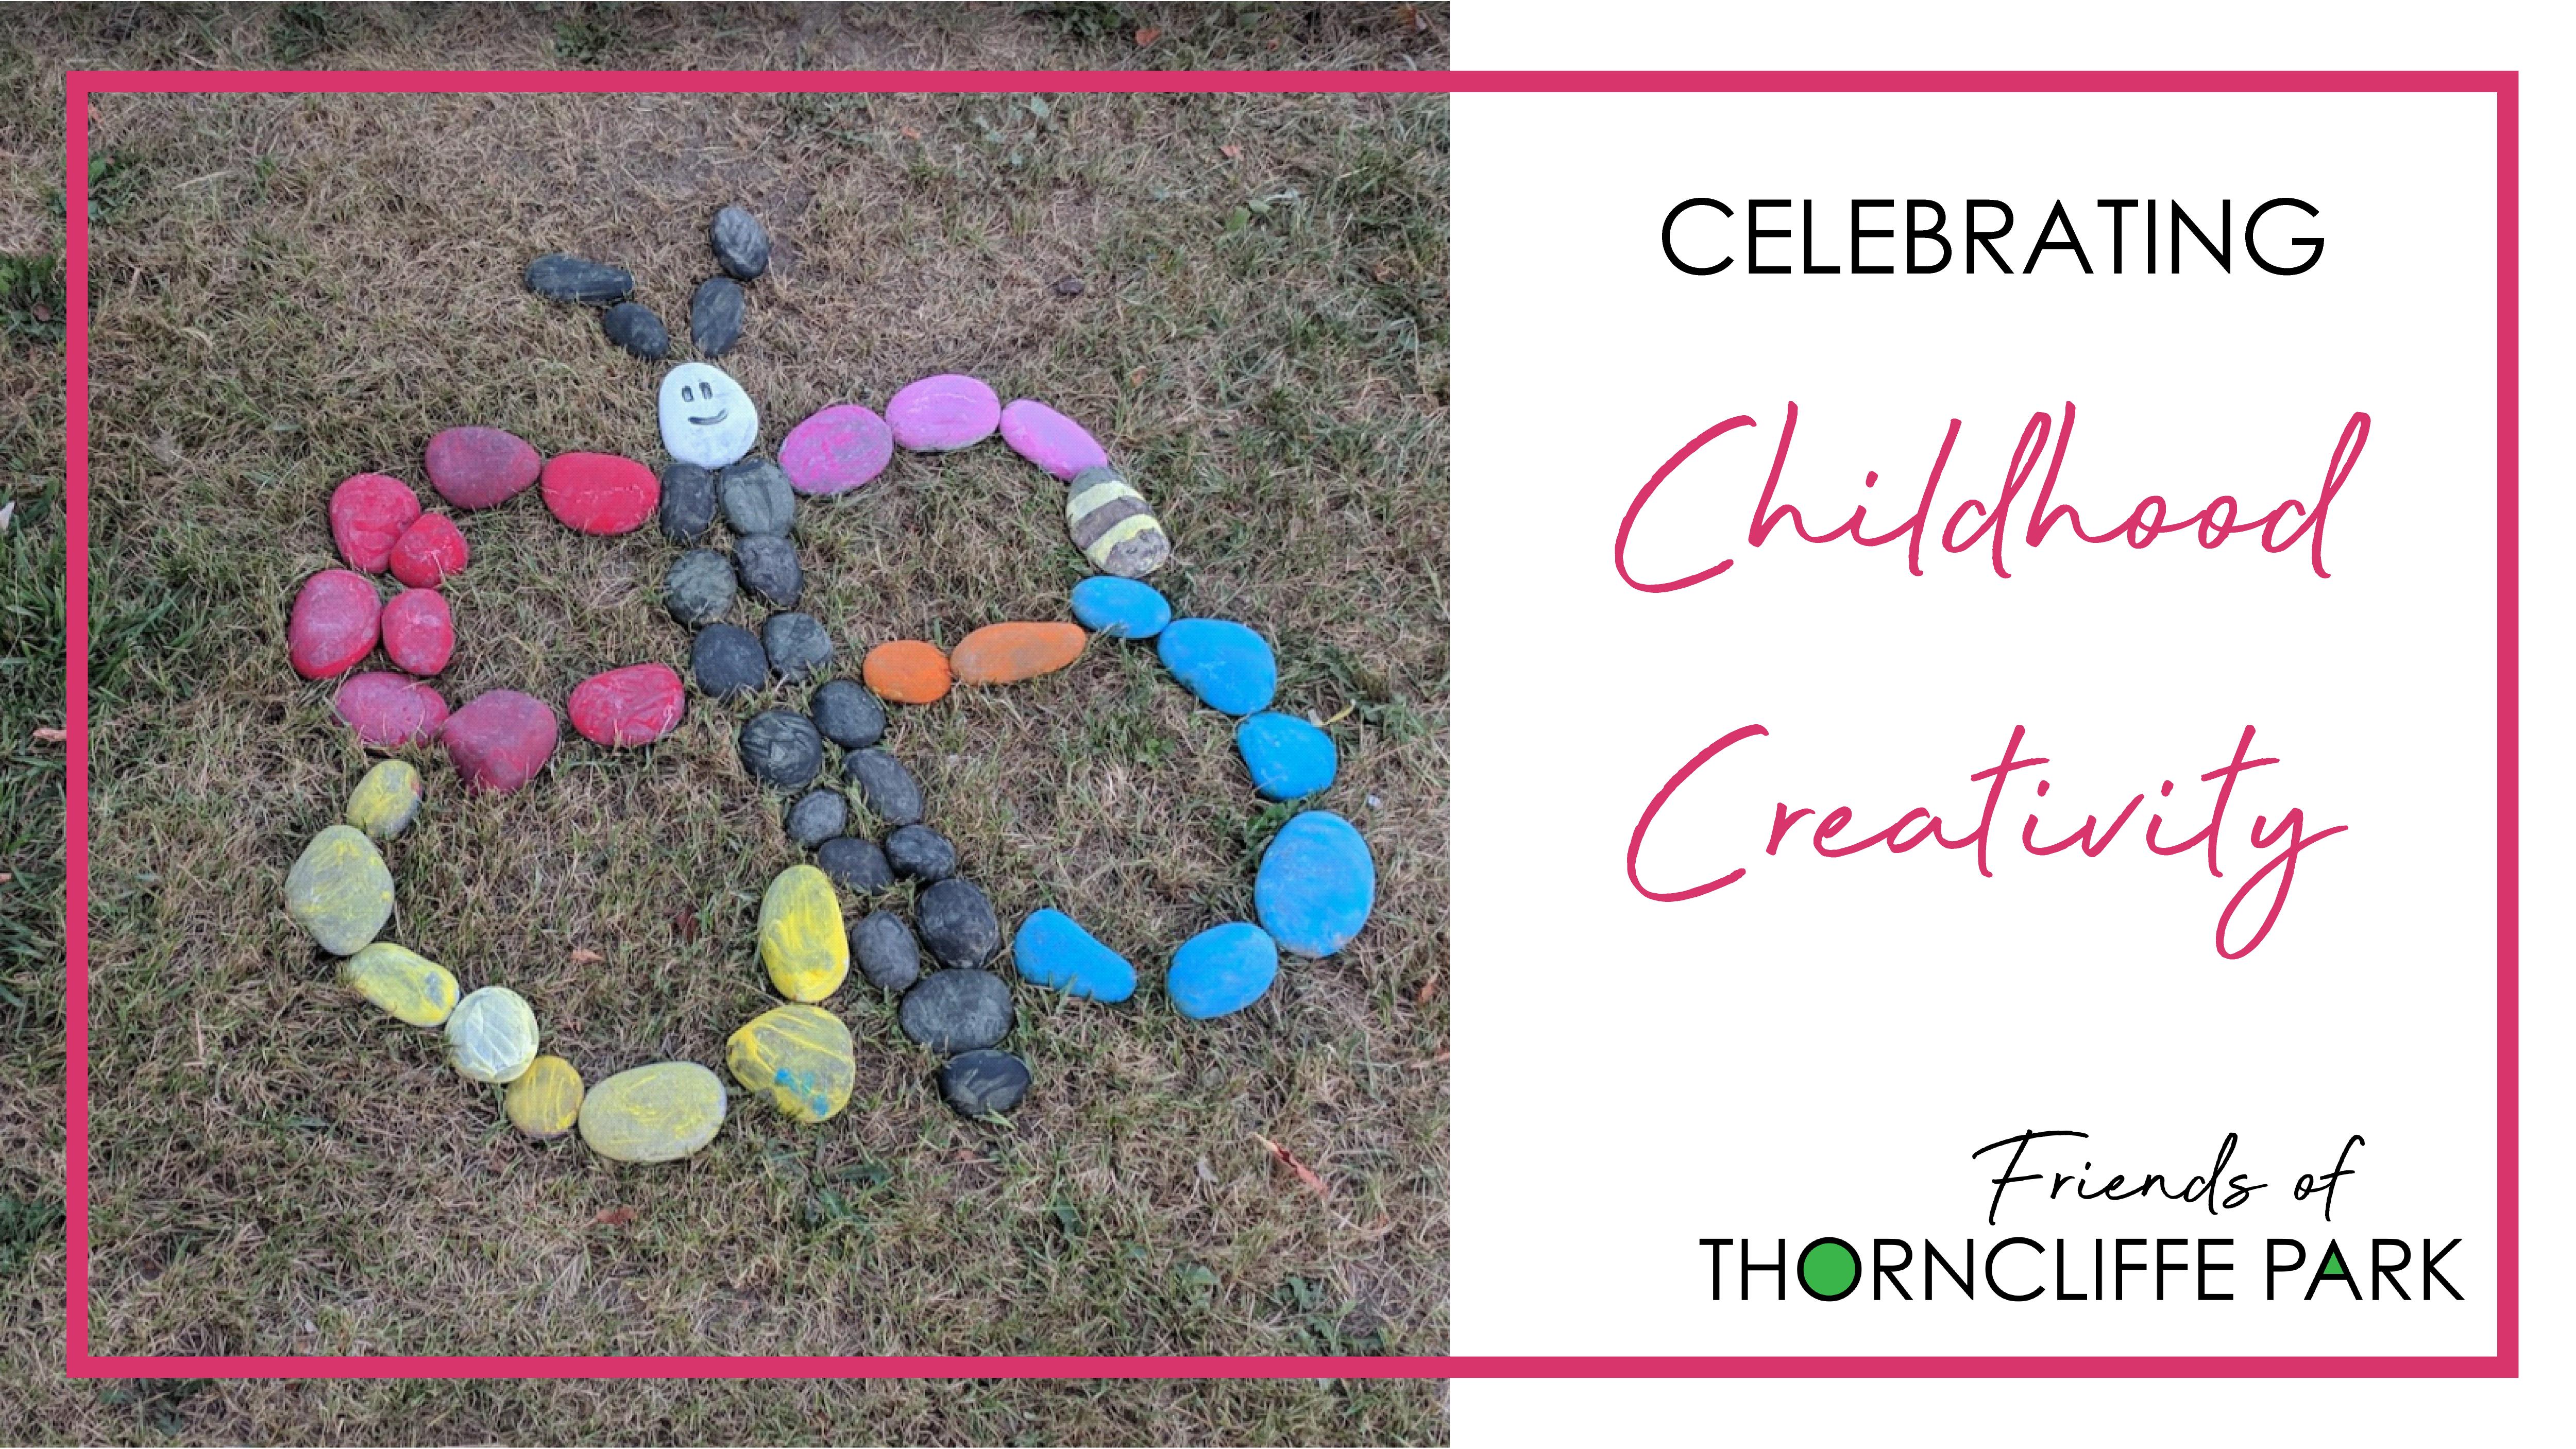 02_Celebrating_Childhood_Creativity.png